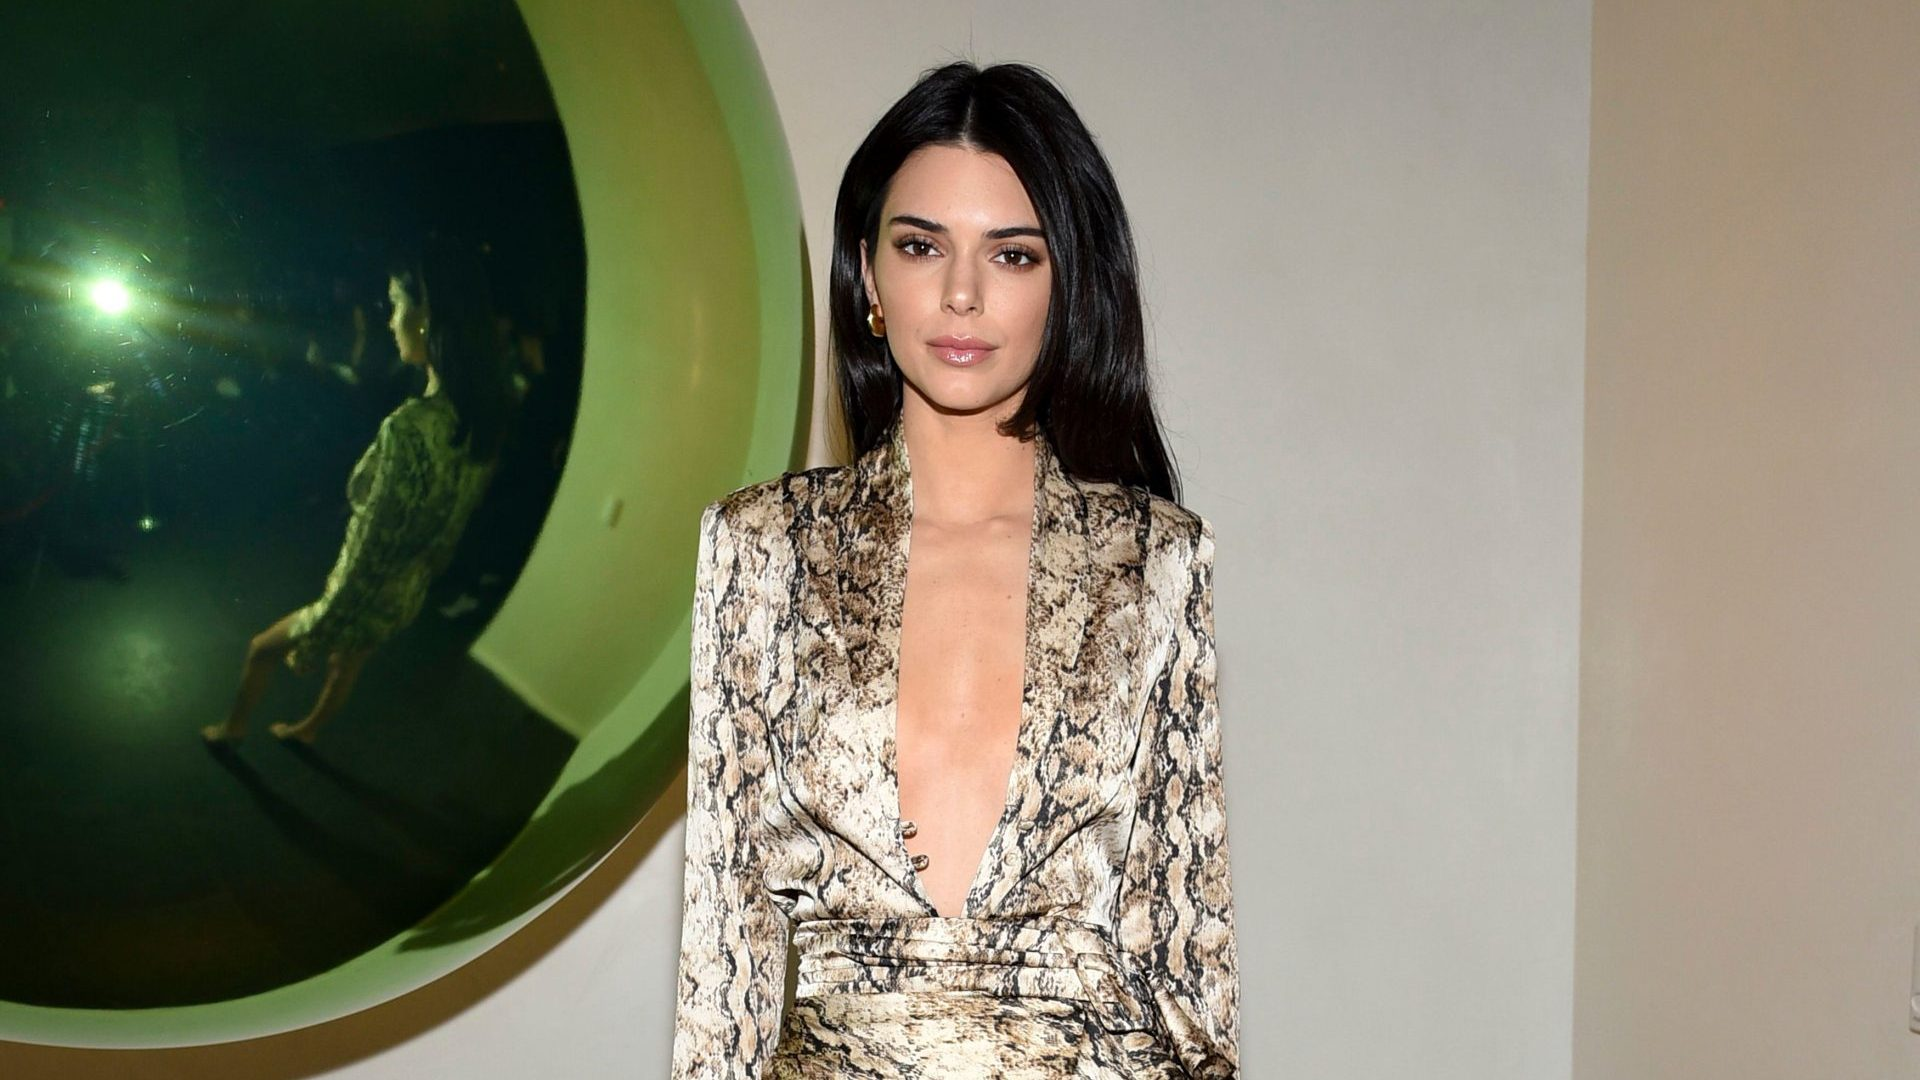 11 Ways to Steal Kendall Jenner's Snakeskin Minidress Look